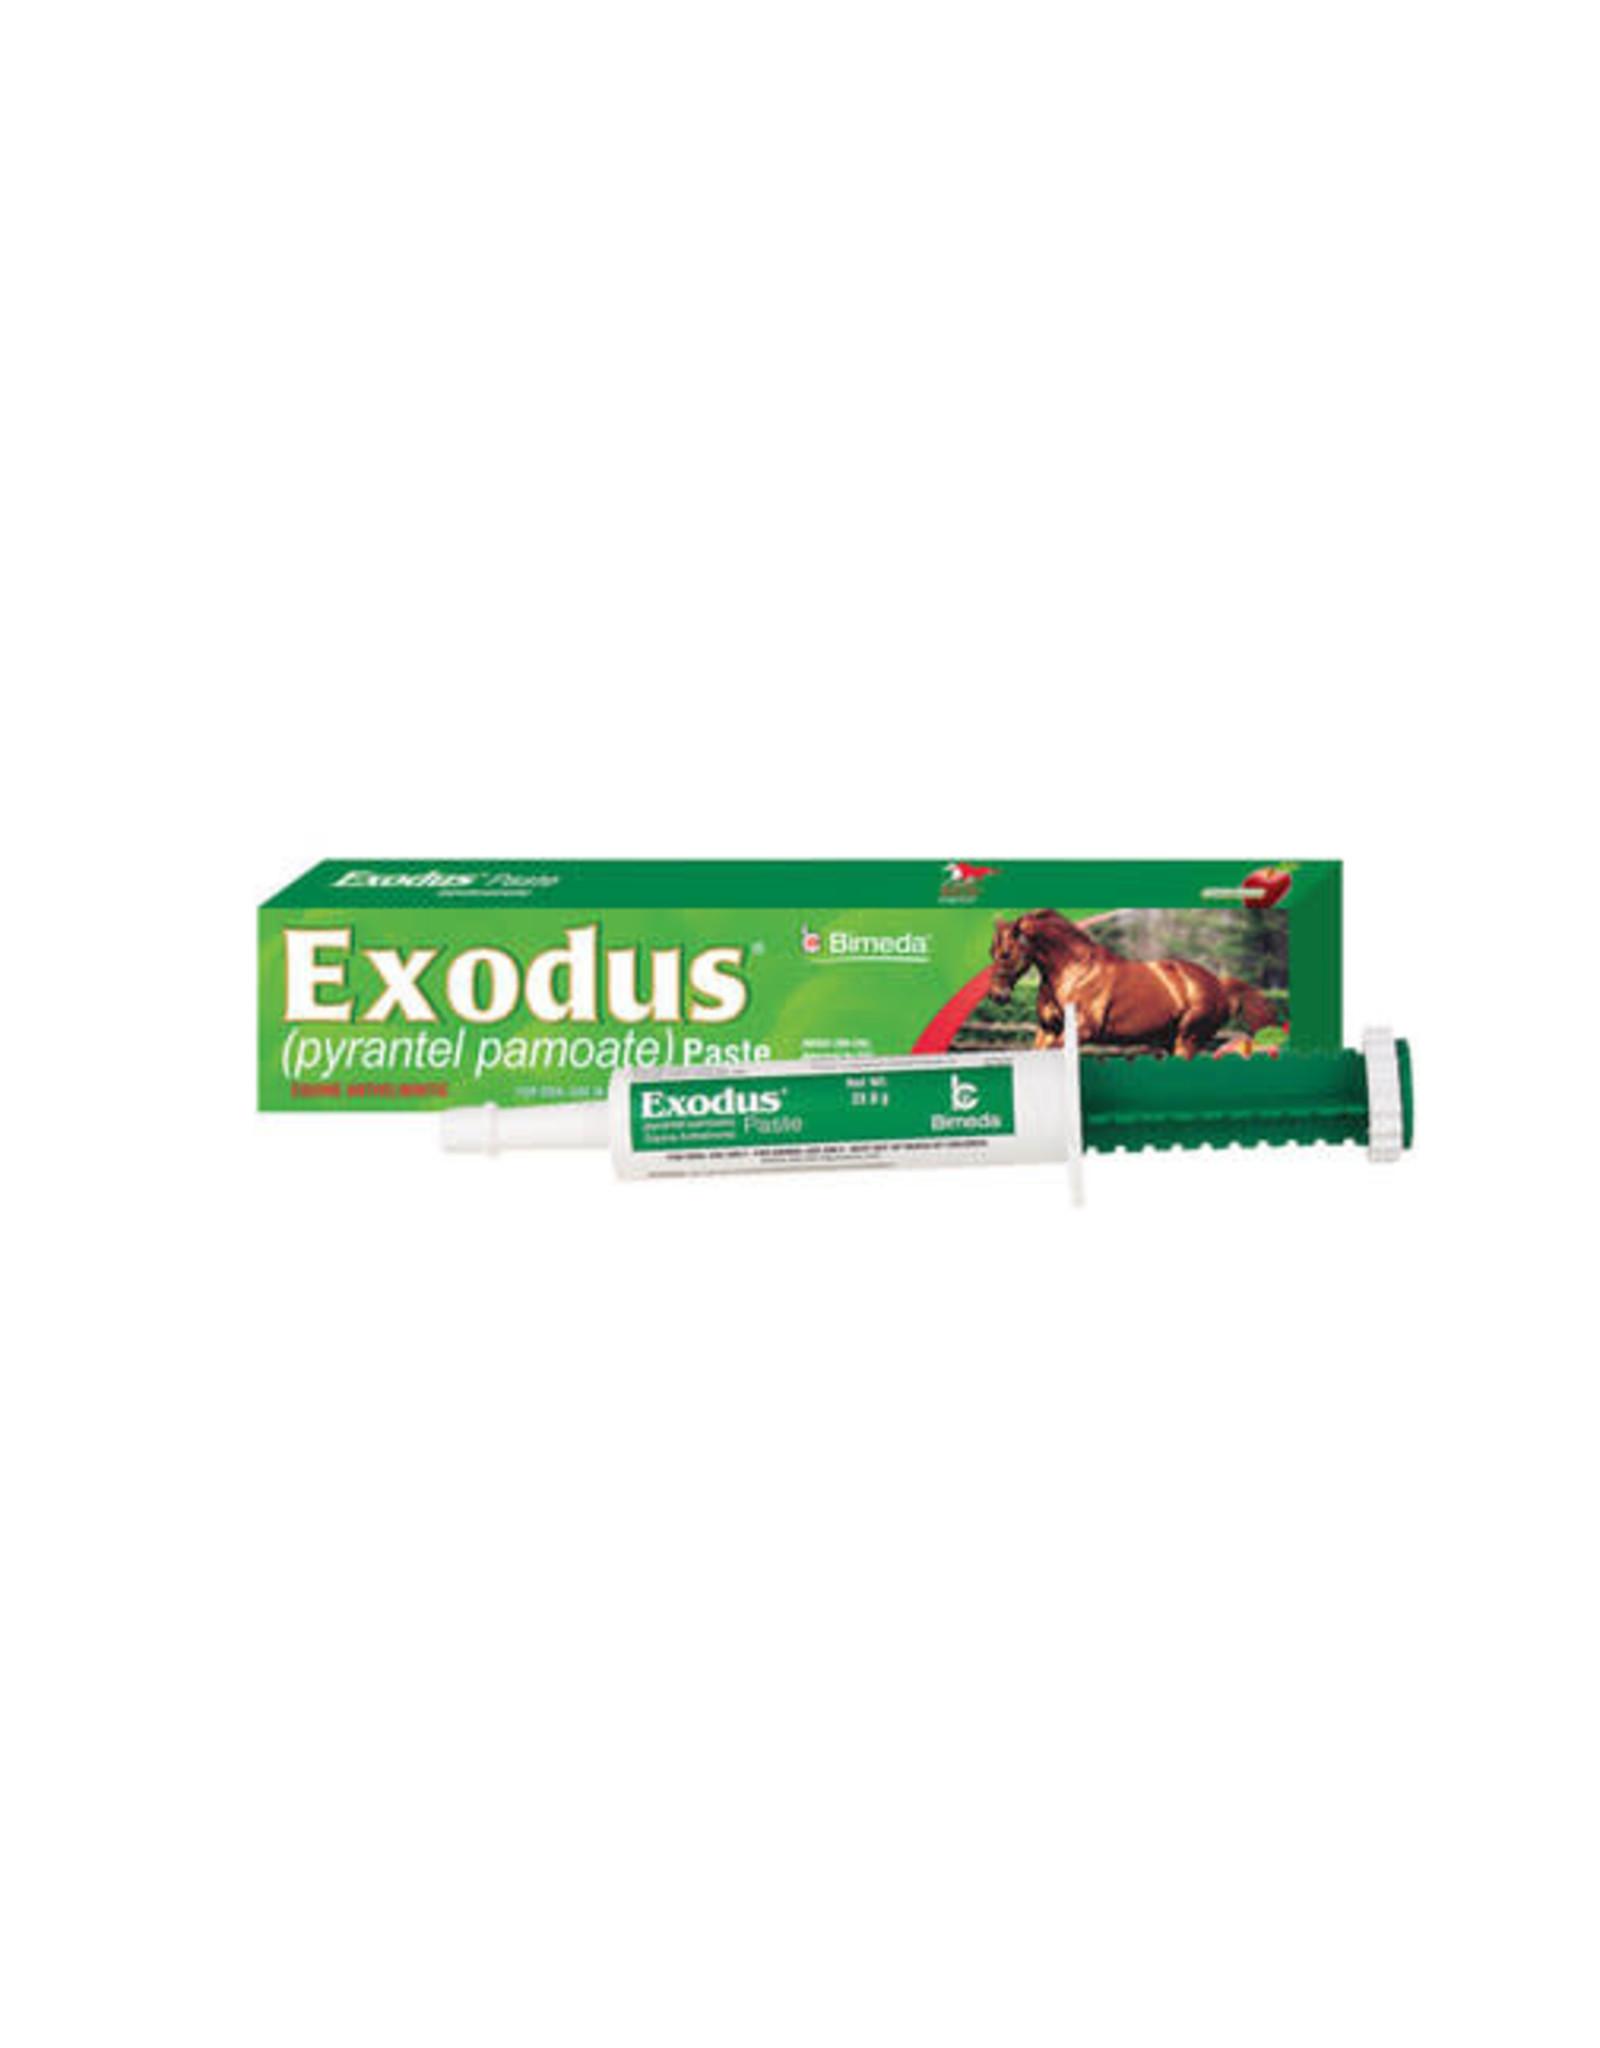 Exodus Pyrantel Pamoate Paste Wormer 23.6g